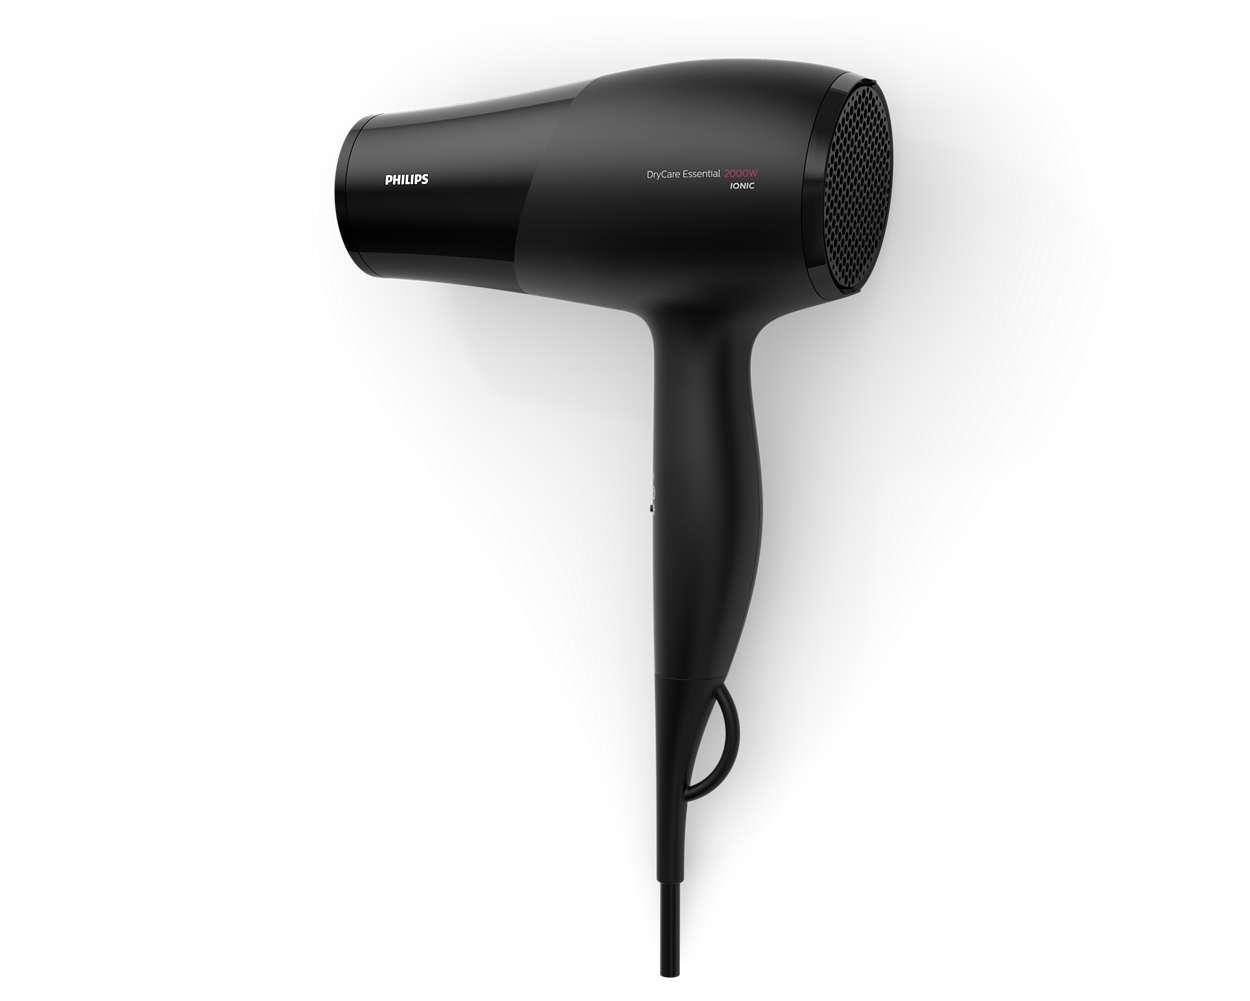 Фен Philips BHD030/00 DryCare Essential Ionic